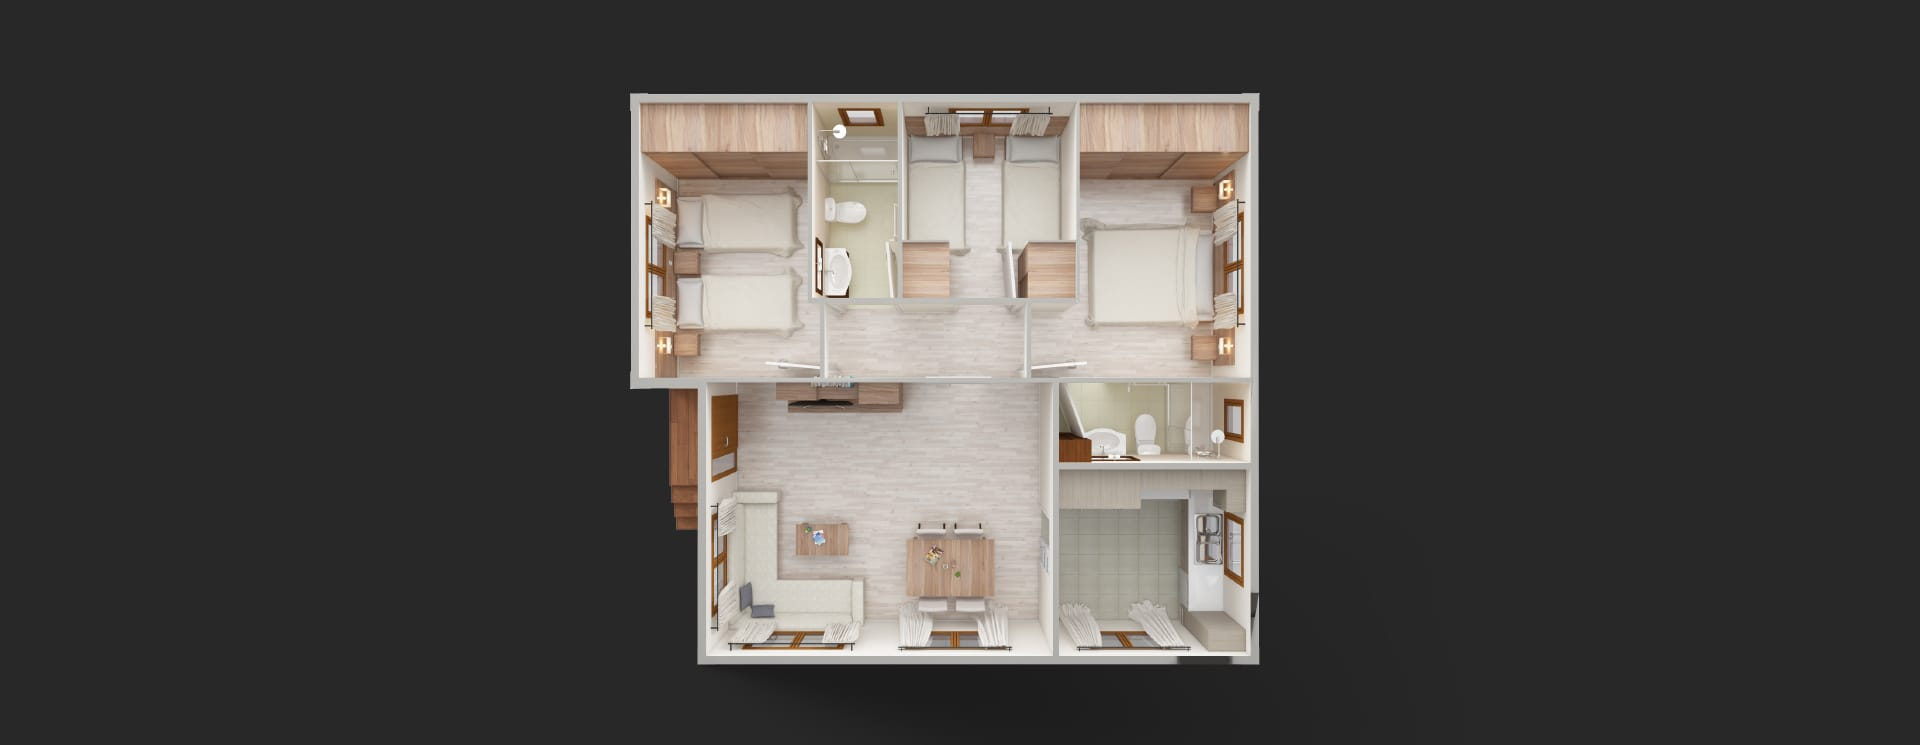 Configura tu casa prefabricada eurocasa - Disenar tu propia casa ...